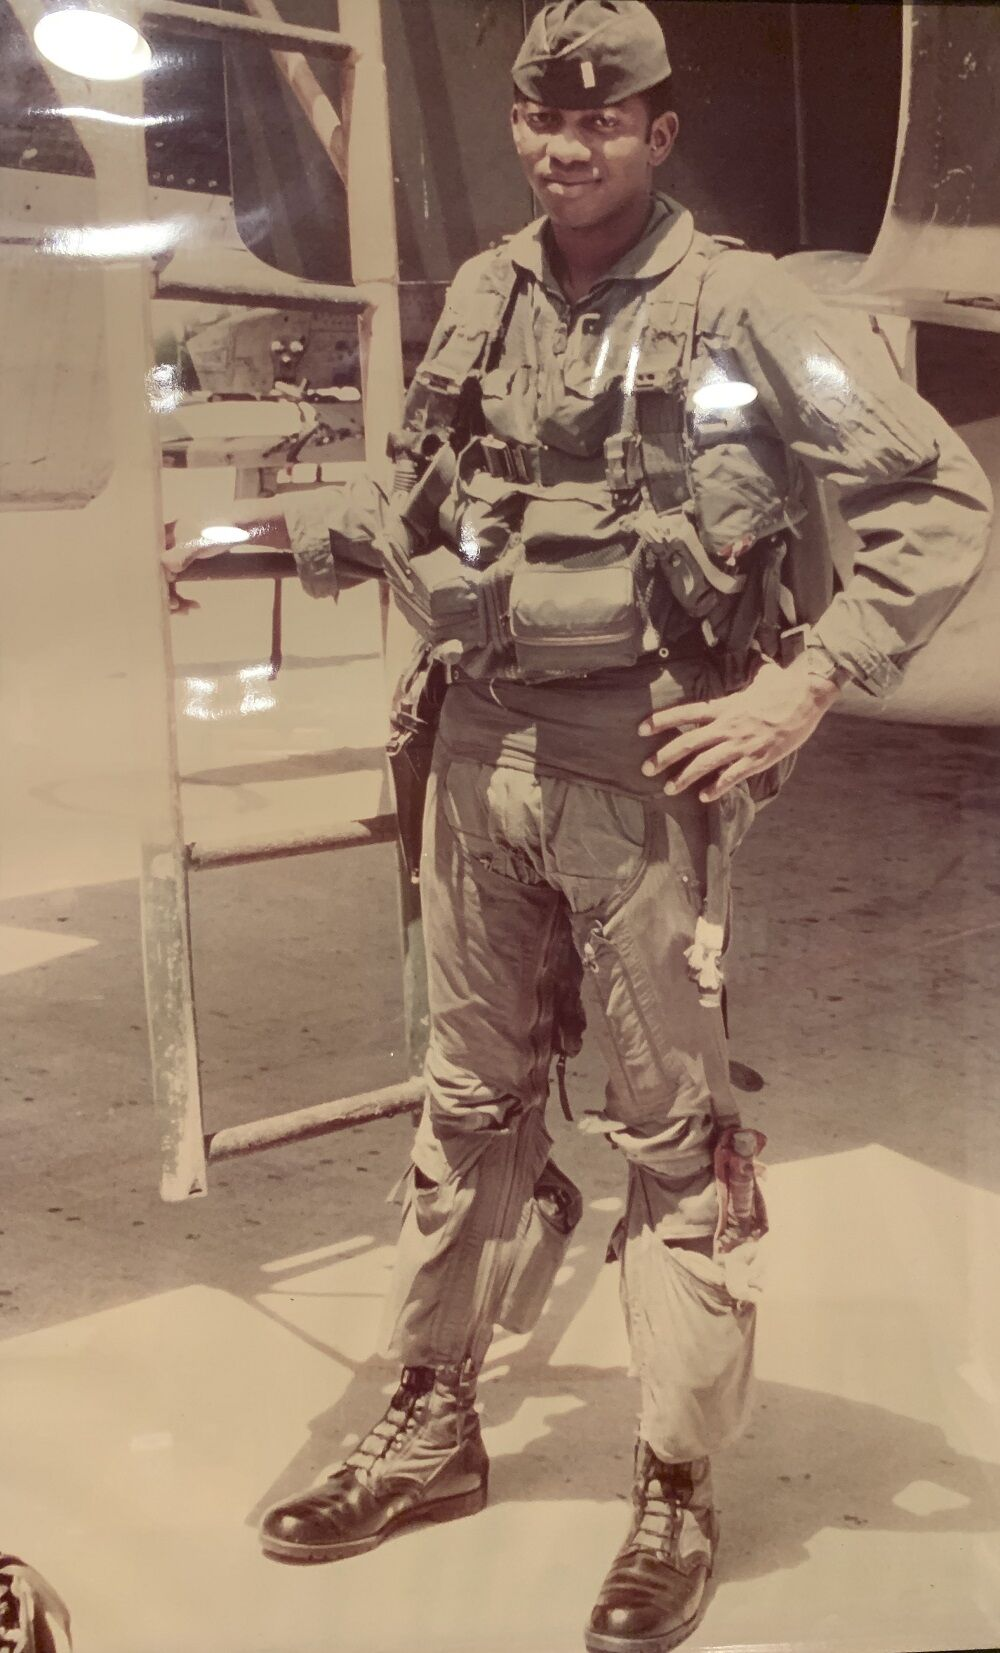 Vietnam vet Fig Newton 2 pilot standing.JPG